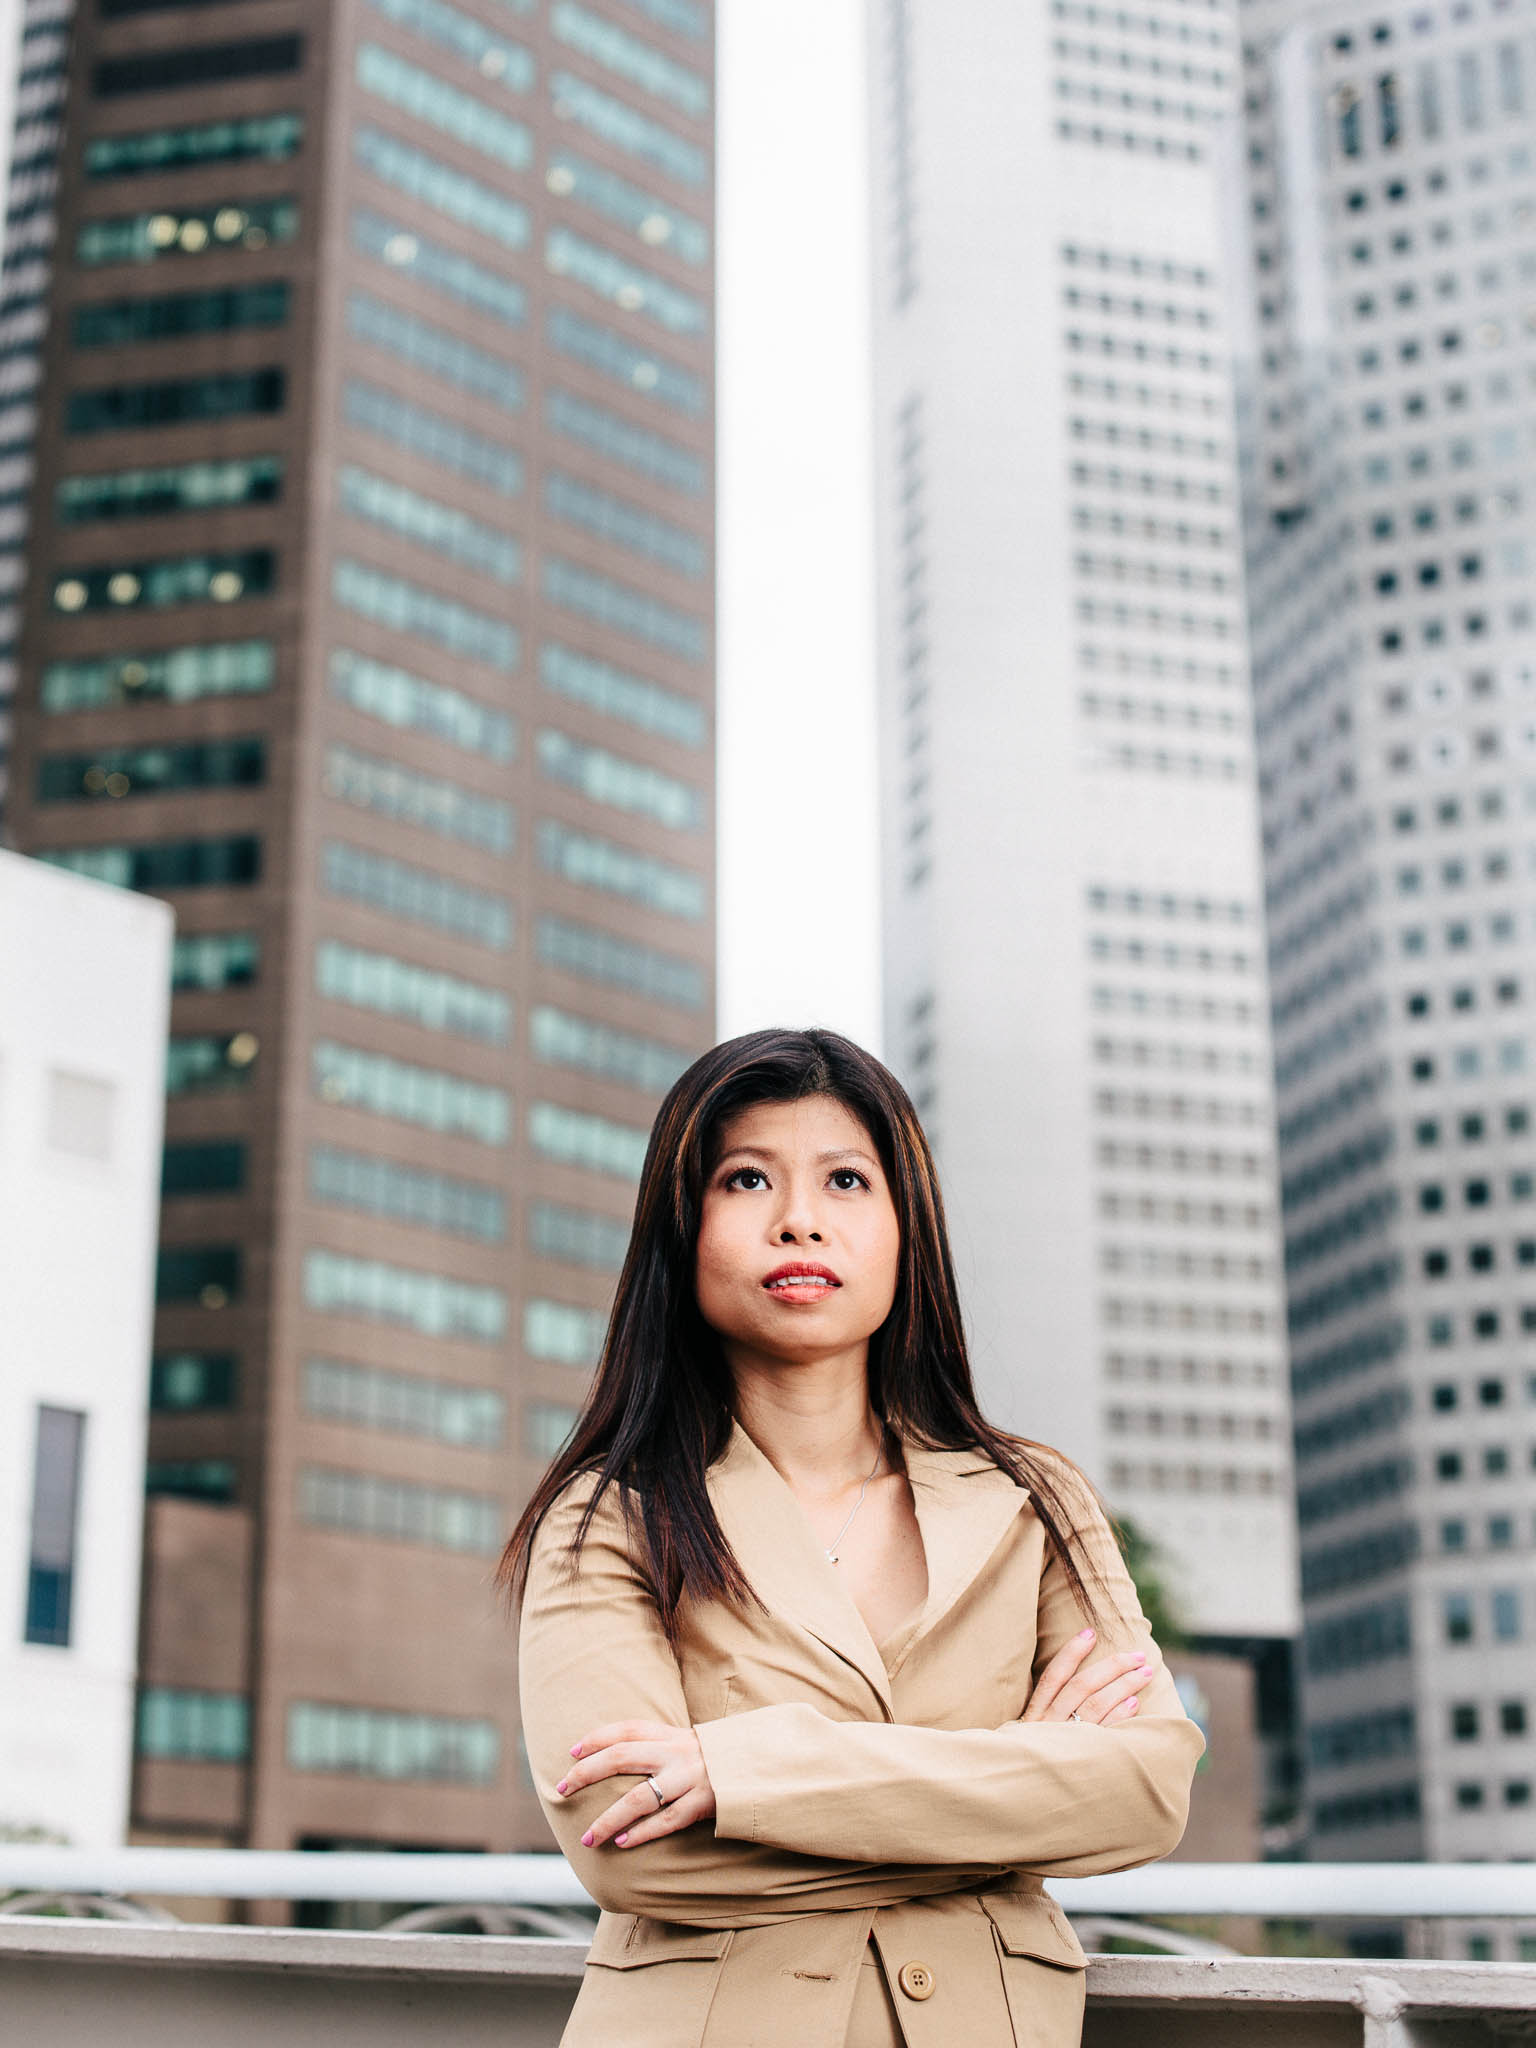 singapore-commercial-editorial-photographer-portraiture-cherlyn-lee-modus-rics-zakaria-zainal-03.jpg